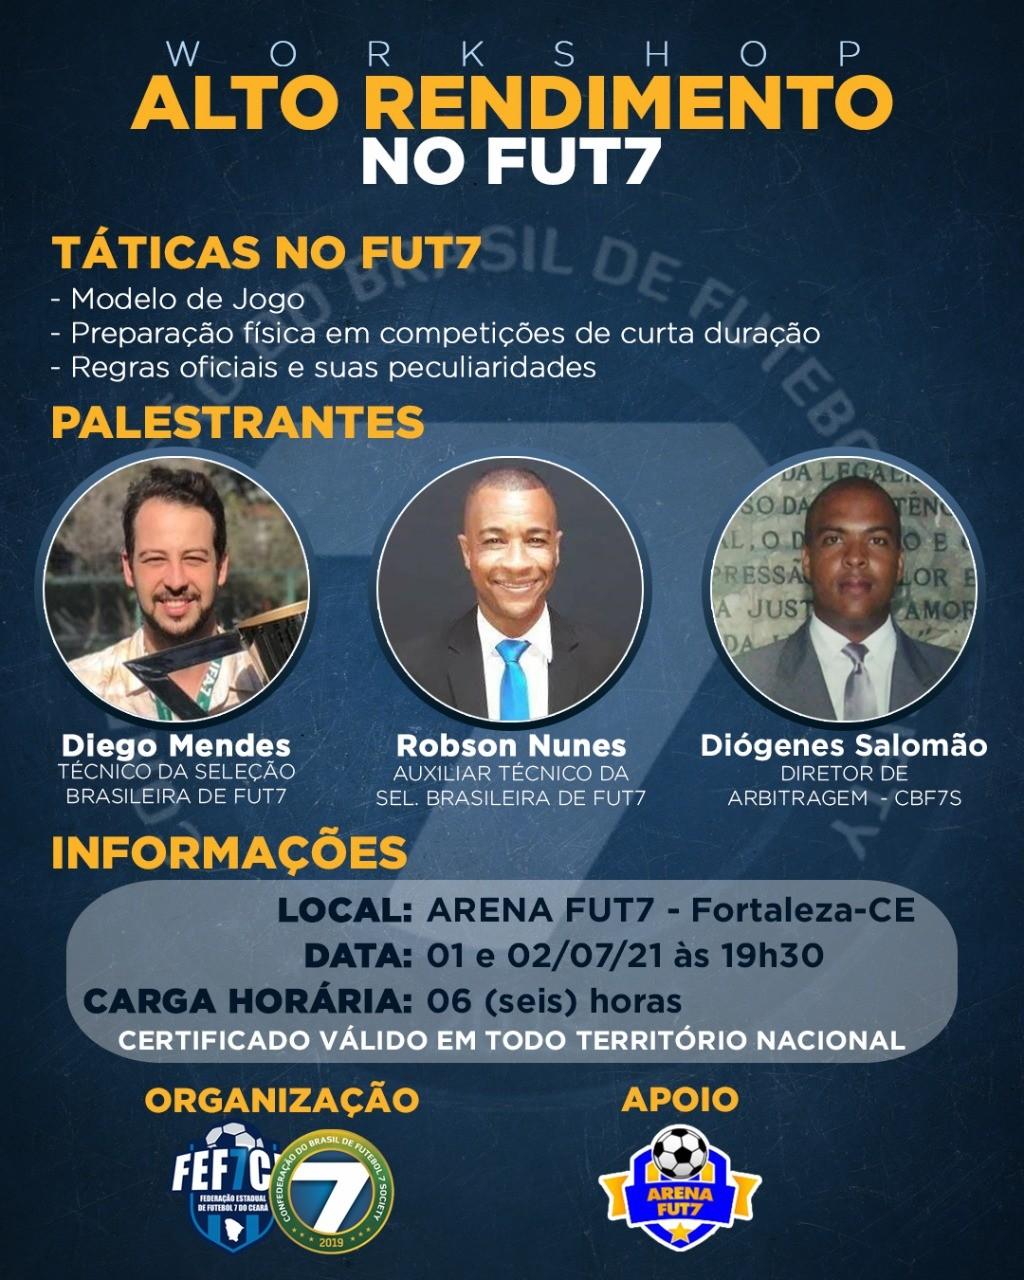 Workshop de alto rendimento no Futebol 7